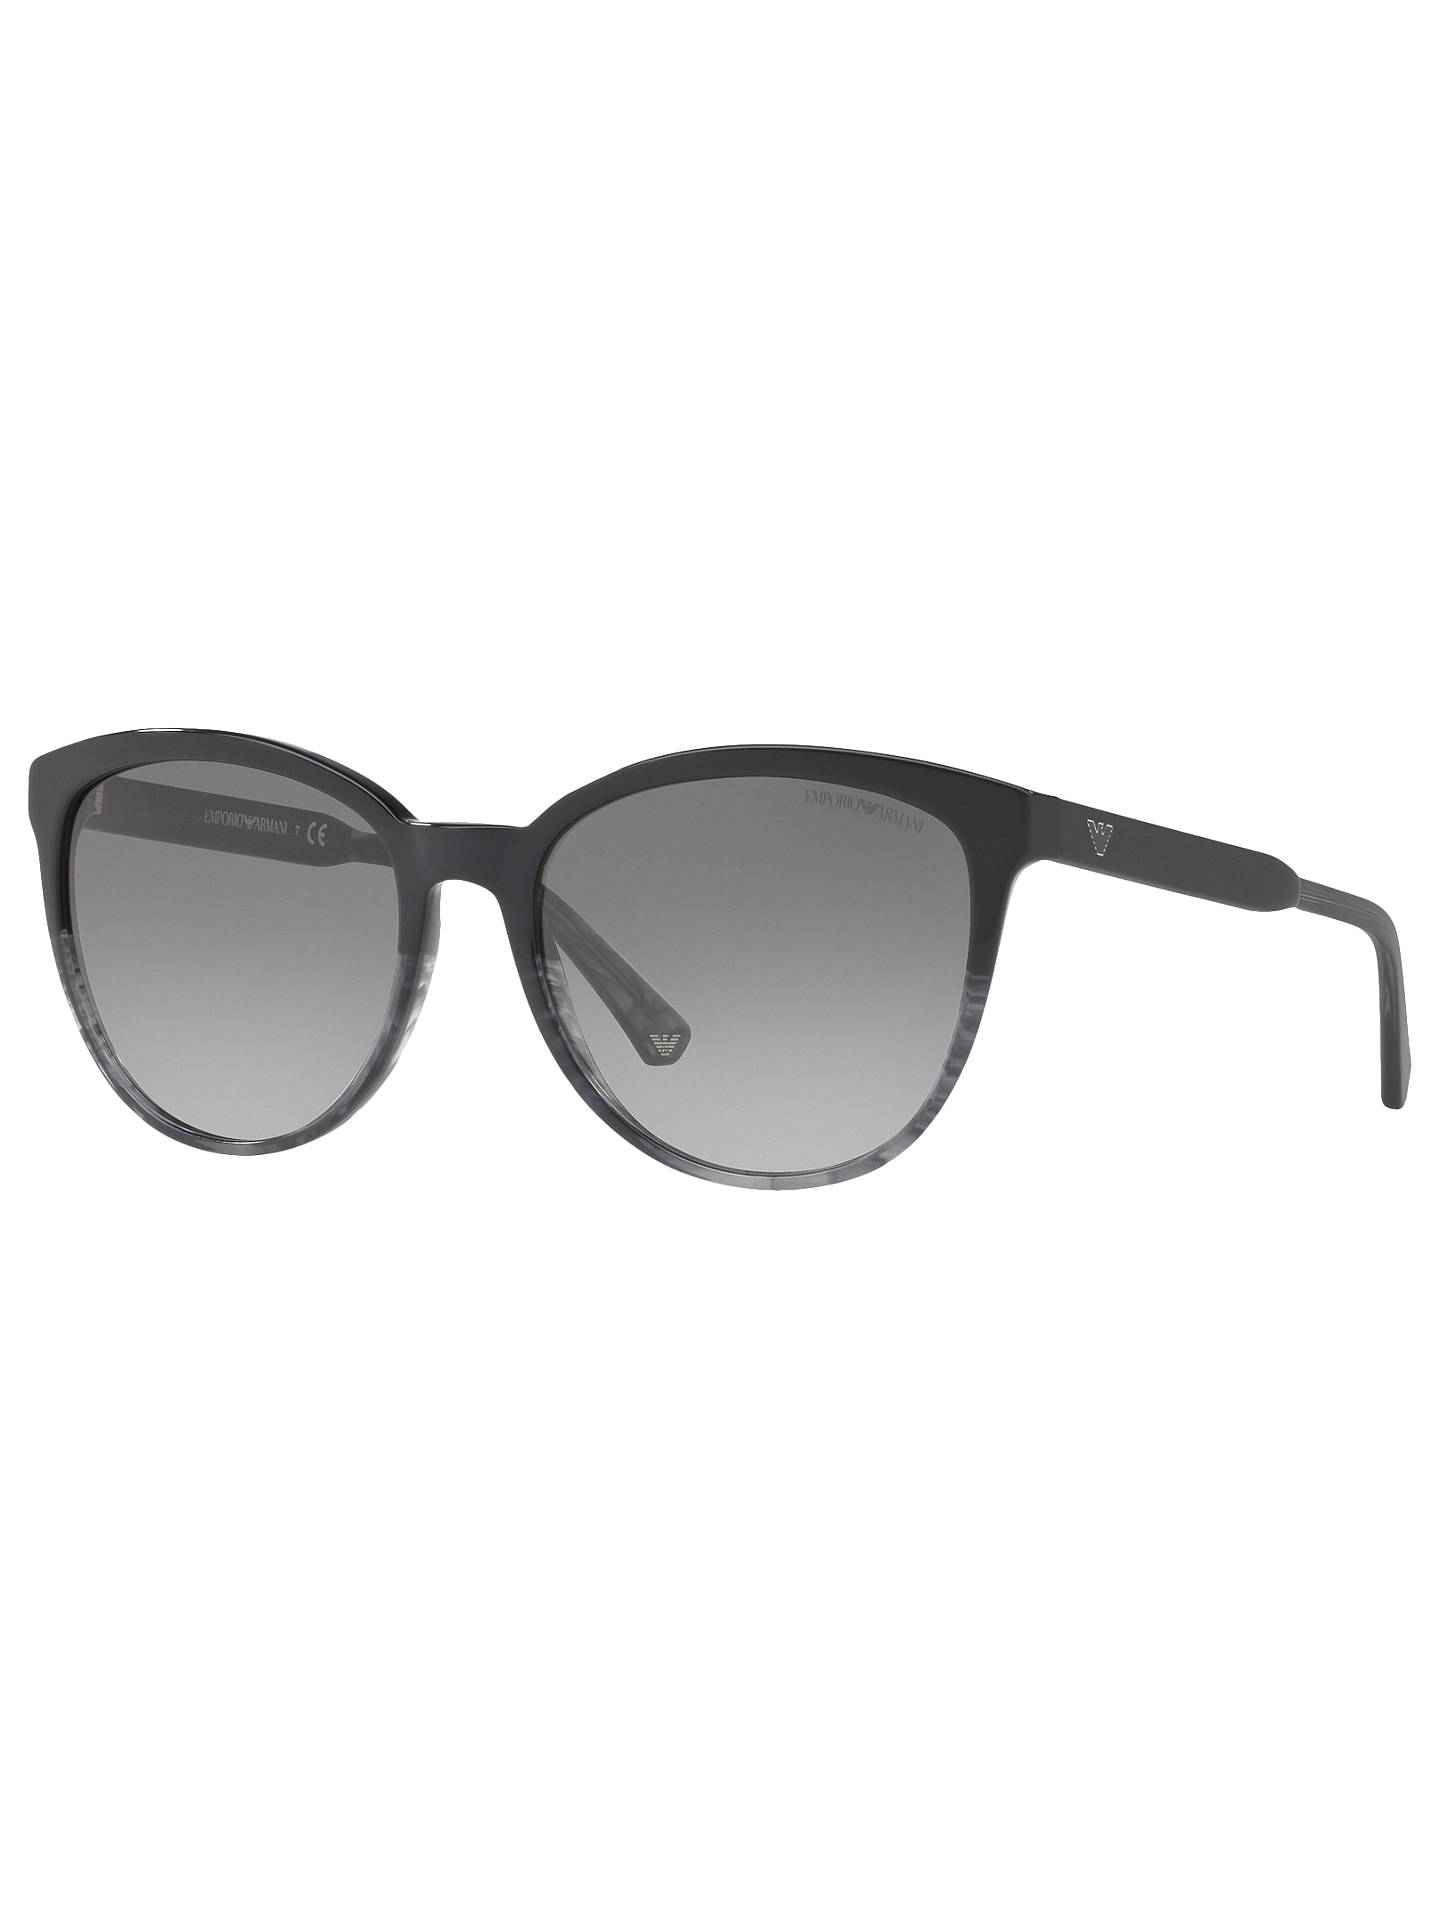 d8b1ce56898 BuyEmporio Armani EA4101 Cat s Eye Sunglasses